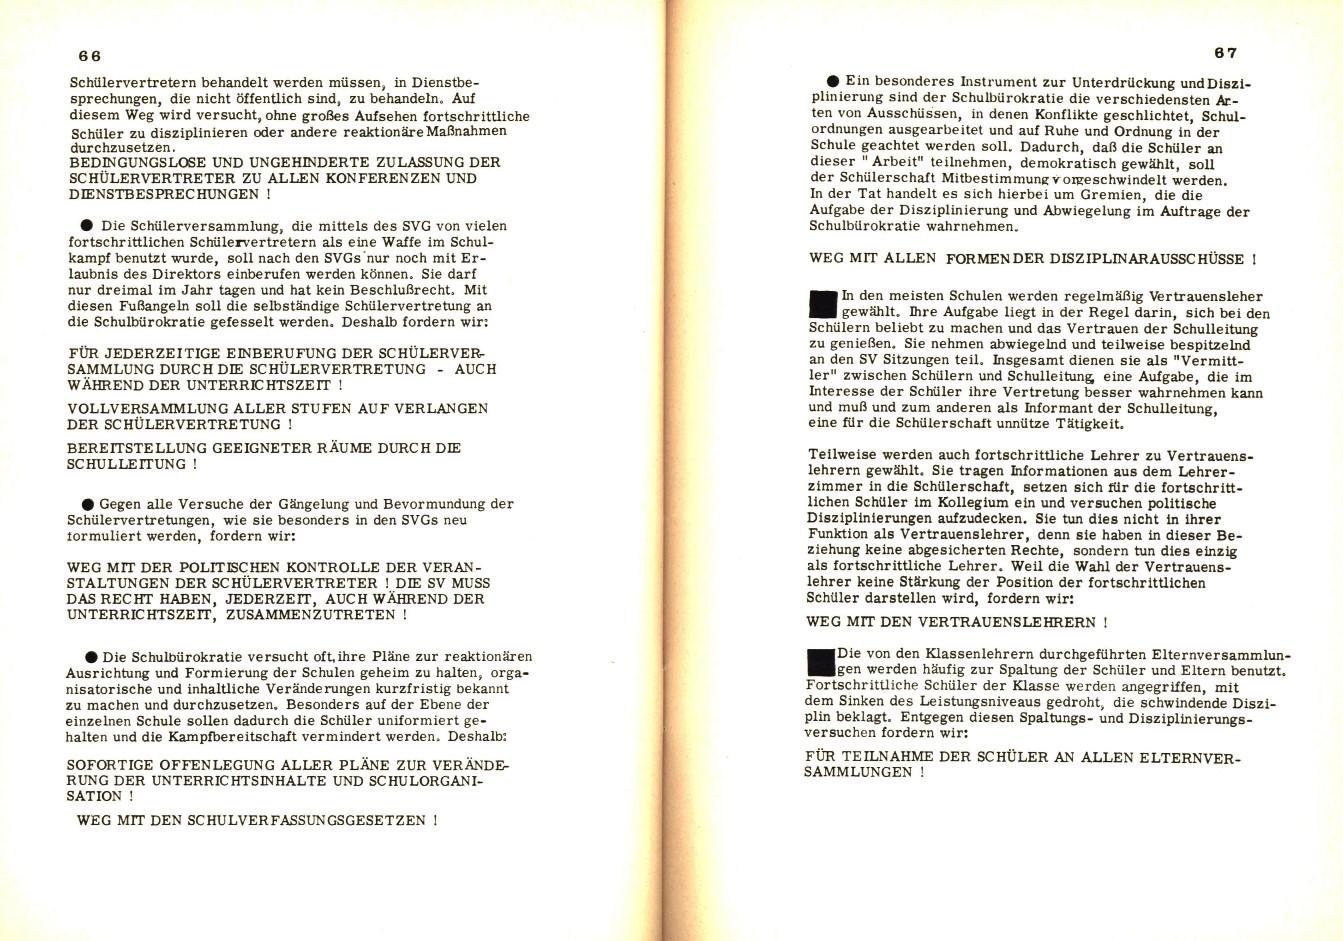 KOV_1973_Aktionsprogramm_36